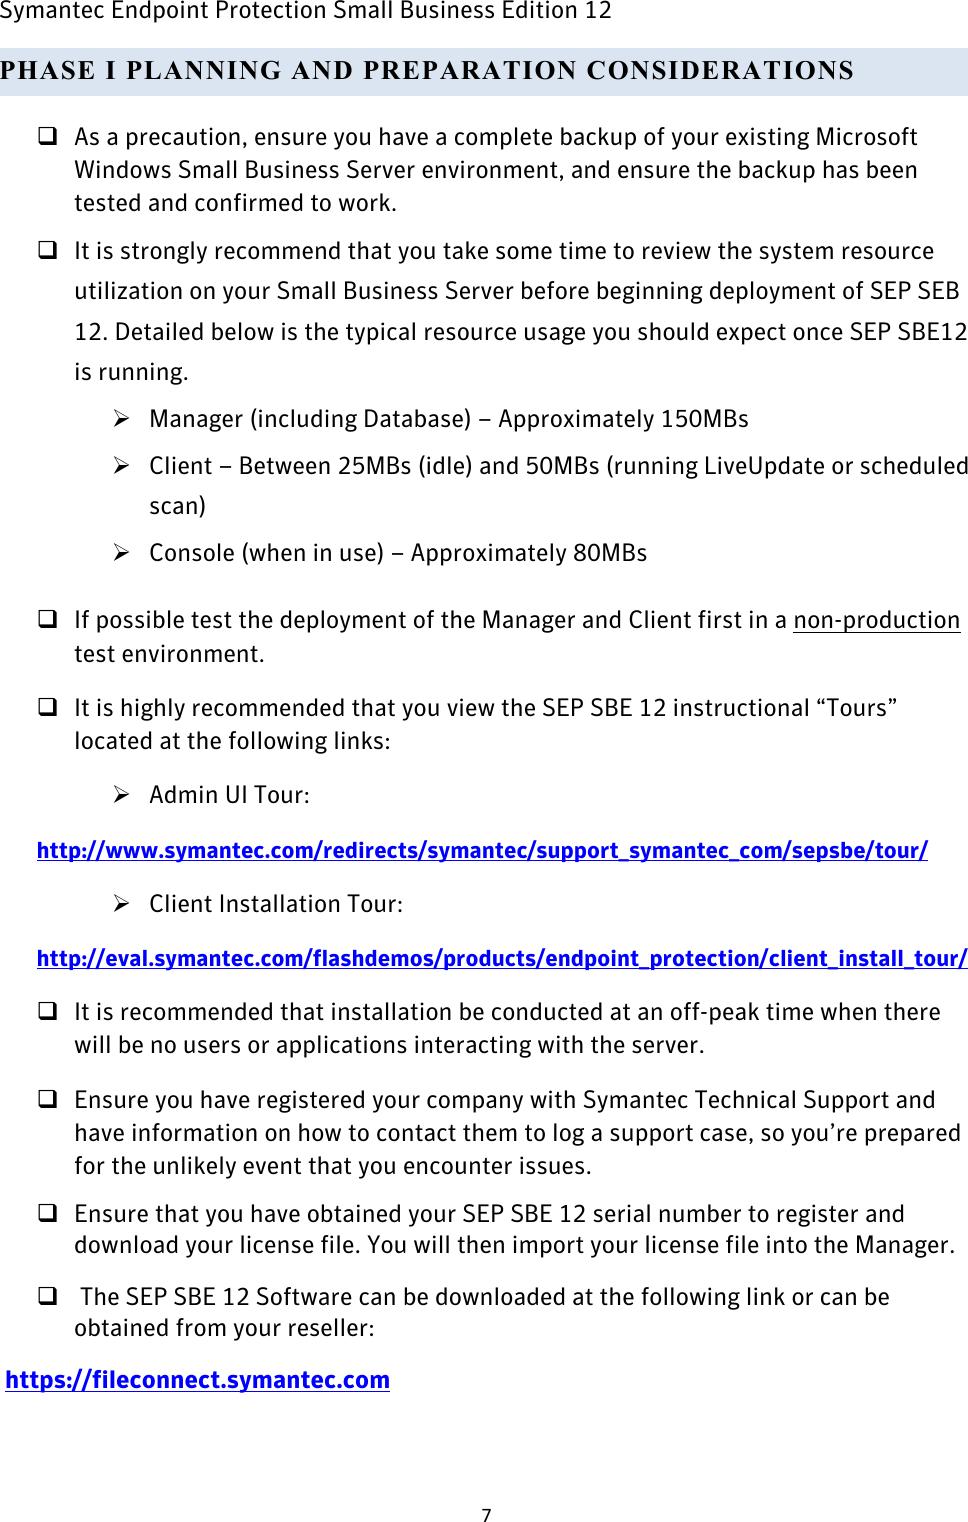 Symantec Best_Practices_SEPSBE12 Endpoint Protection 12 0